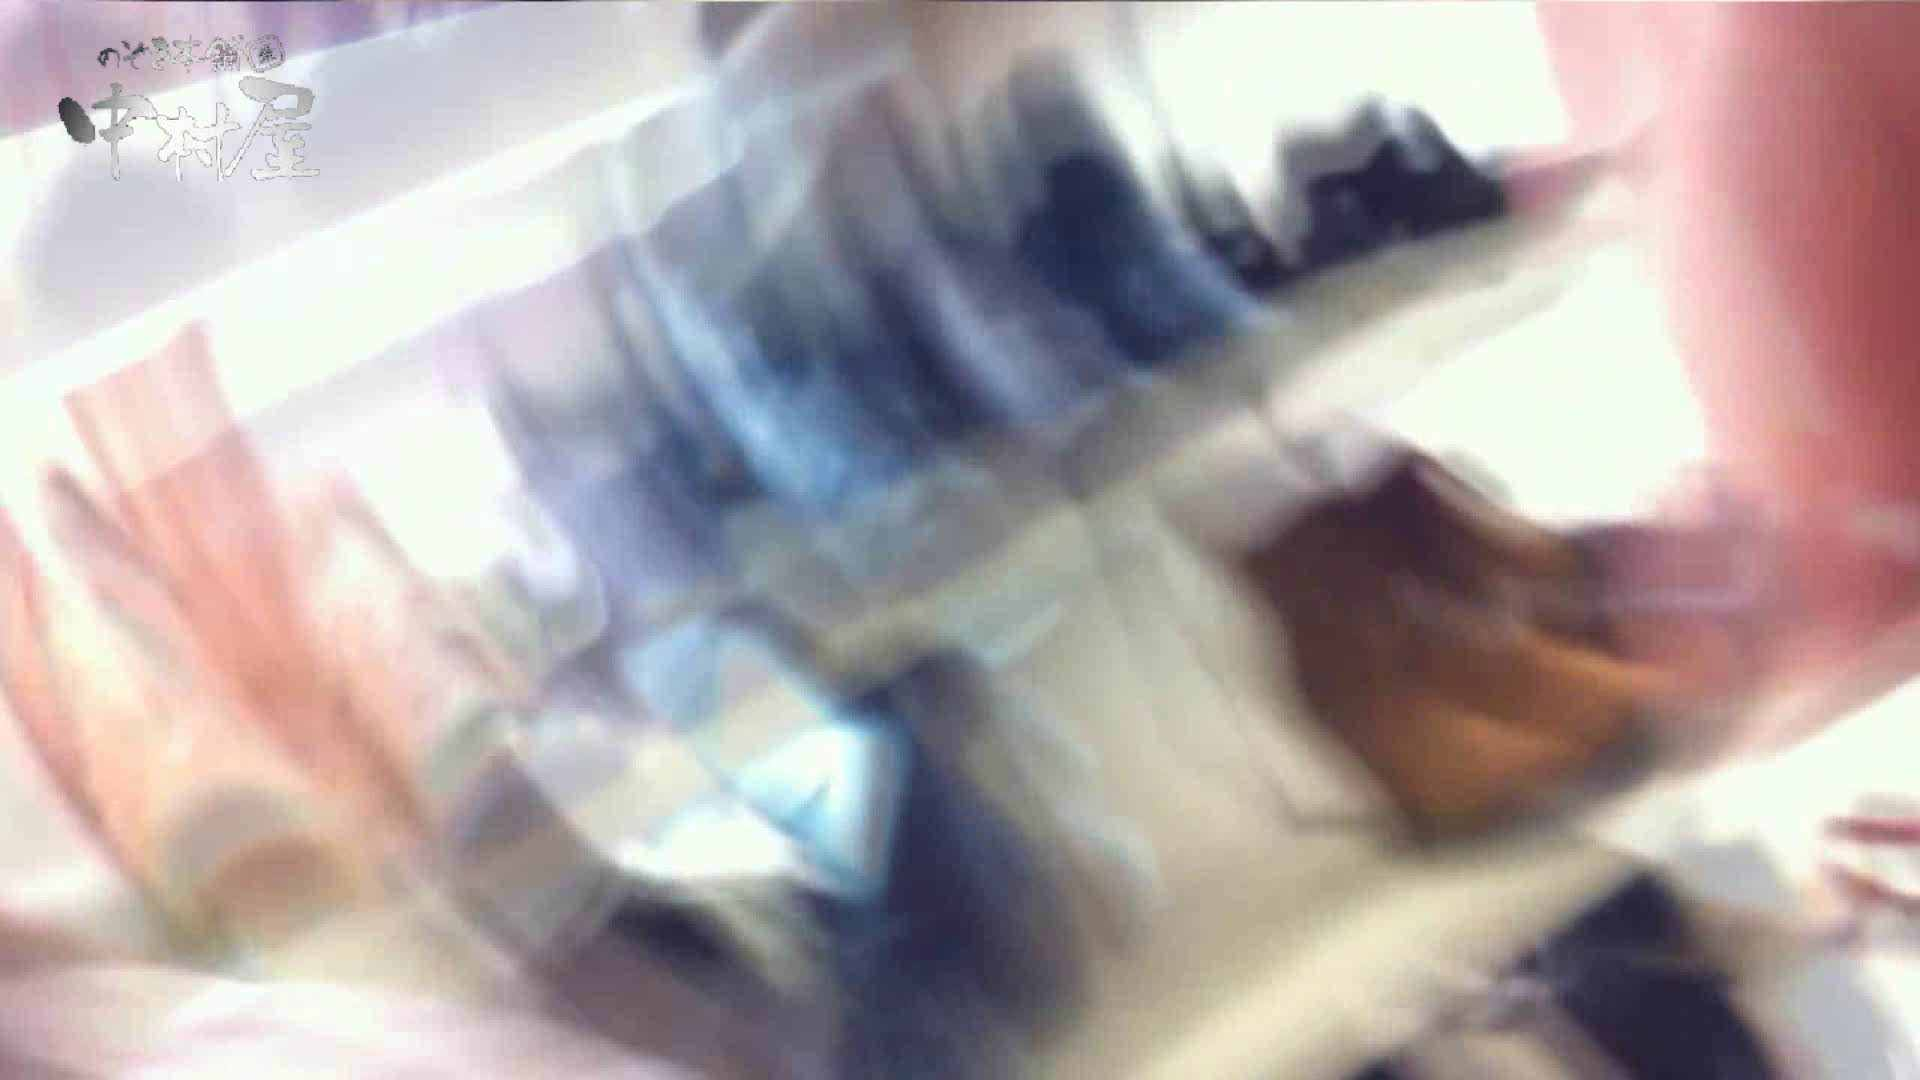 vol.45 可愛いカリスマ店員限定‼胸チラ&パンチラ 食い込みミッキーマウス! おまんこモロ出し   接写  107pic 45